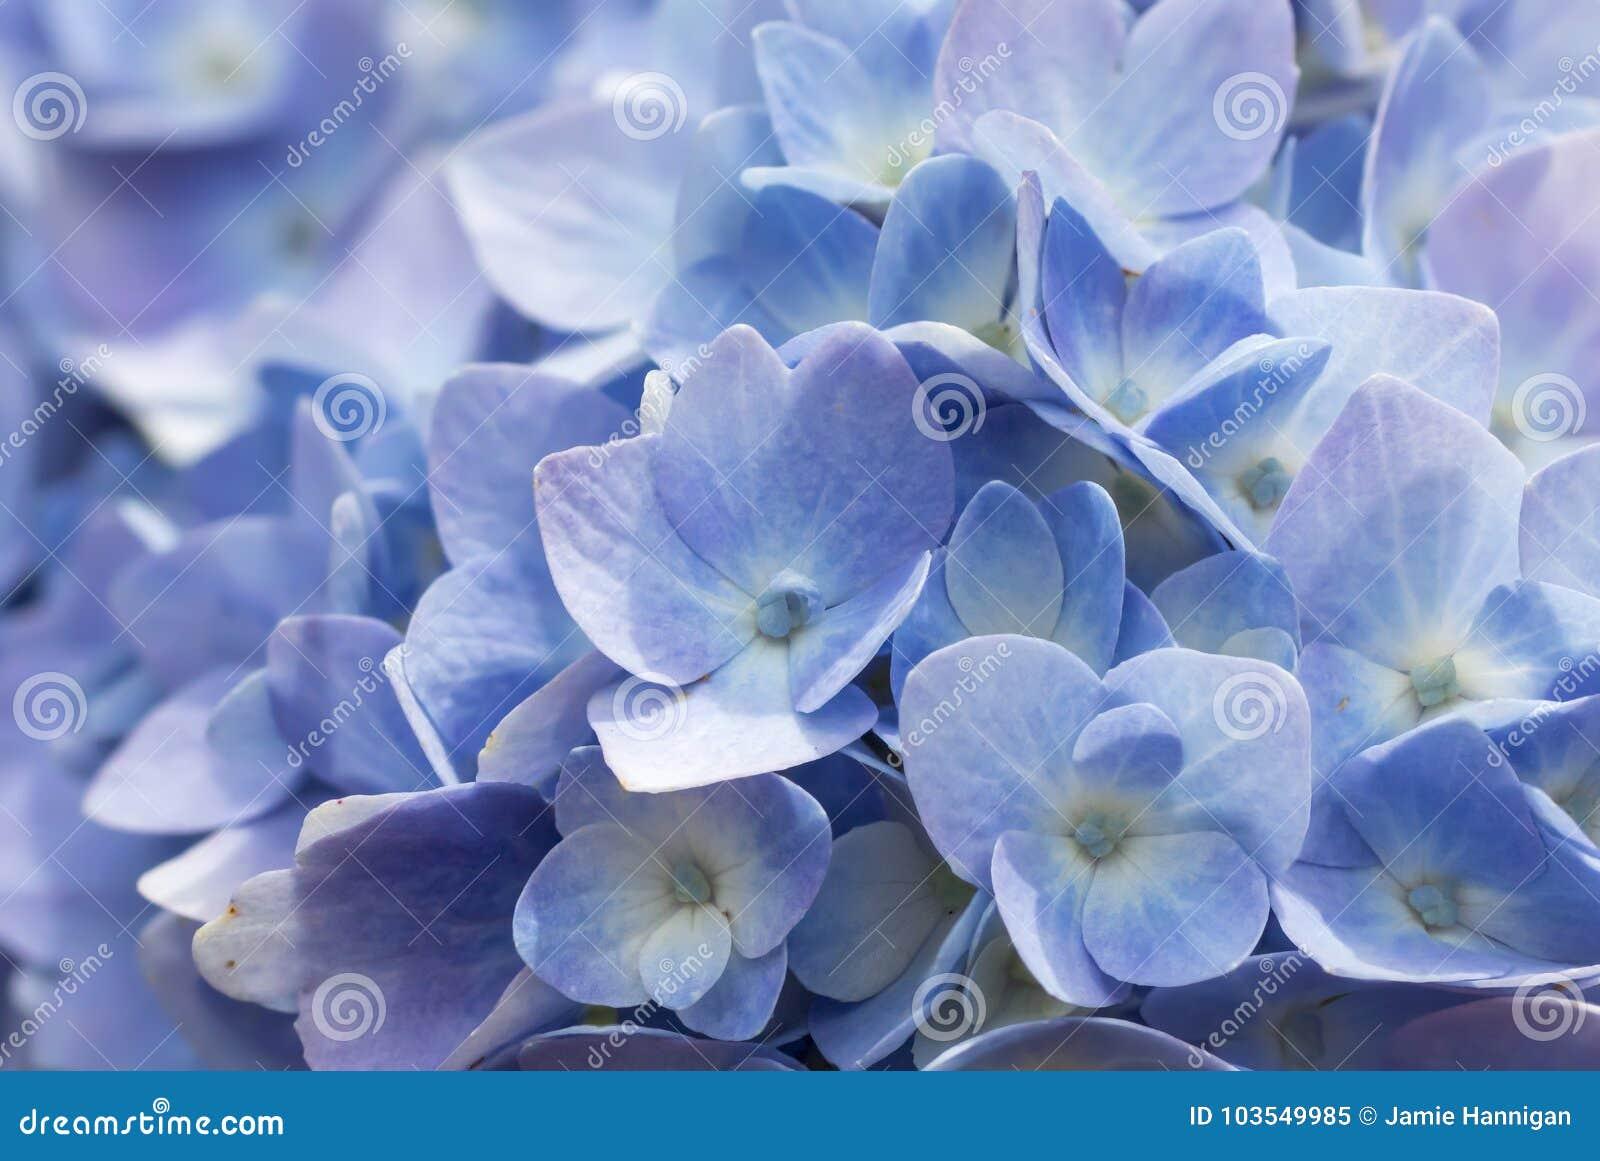 Macro blue and purple hydrangea stock image image of sprng nature download macro blue and purple hydrangea stock image image of sprng nature 103549985 izmirmasajfo